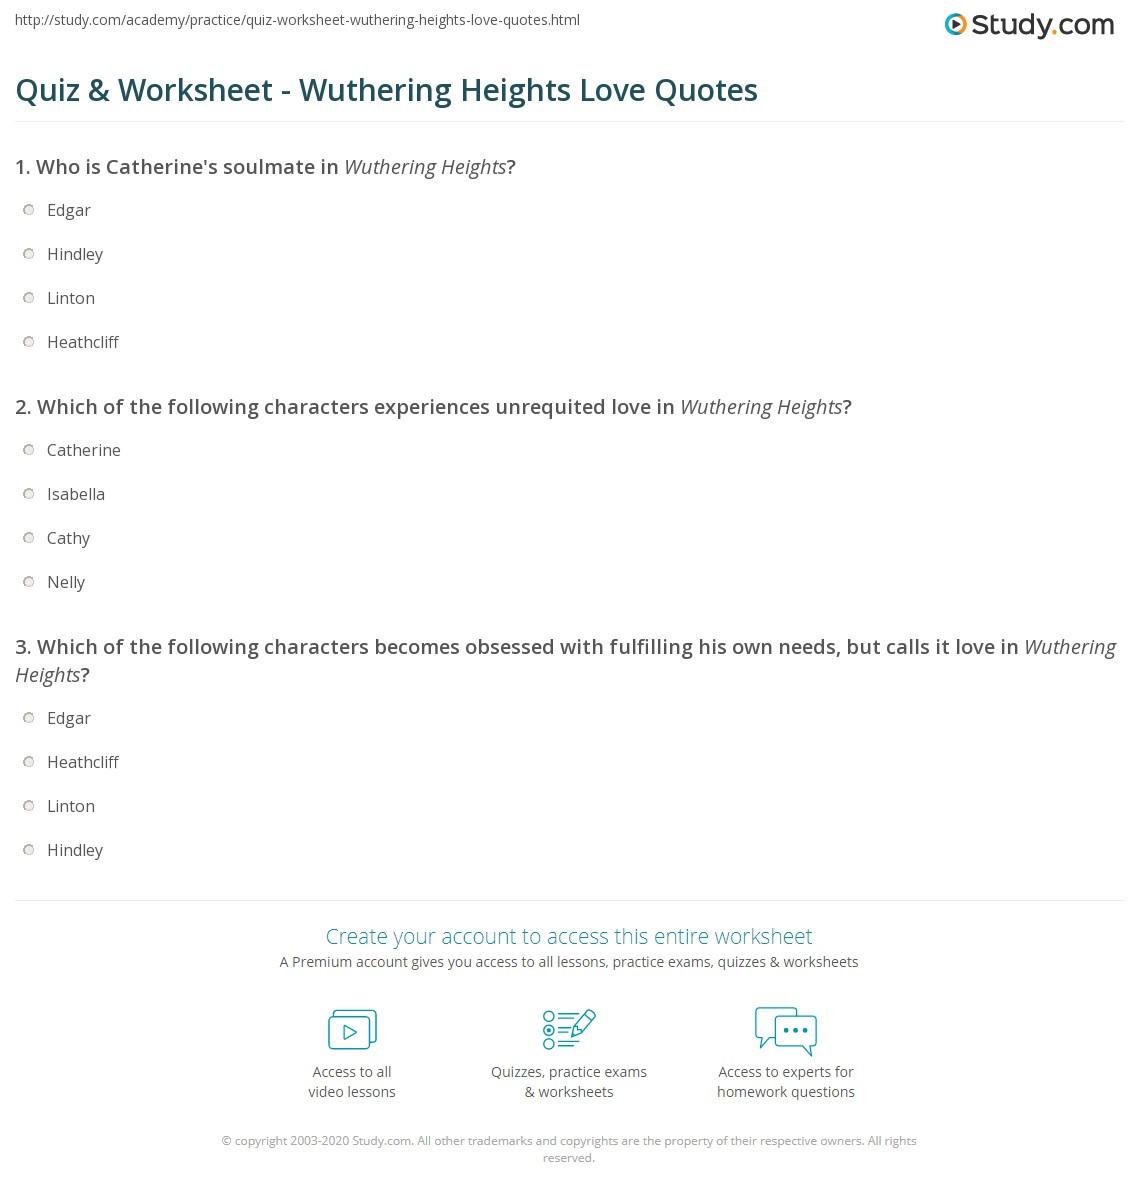 30 Prime Factorization Tree Worksheet